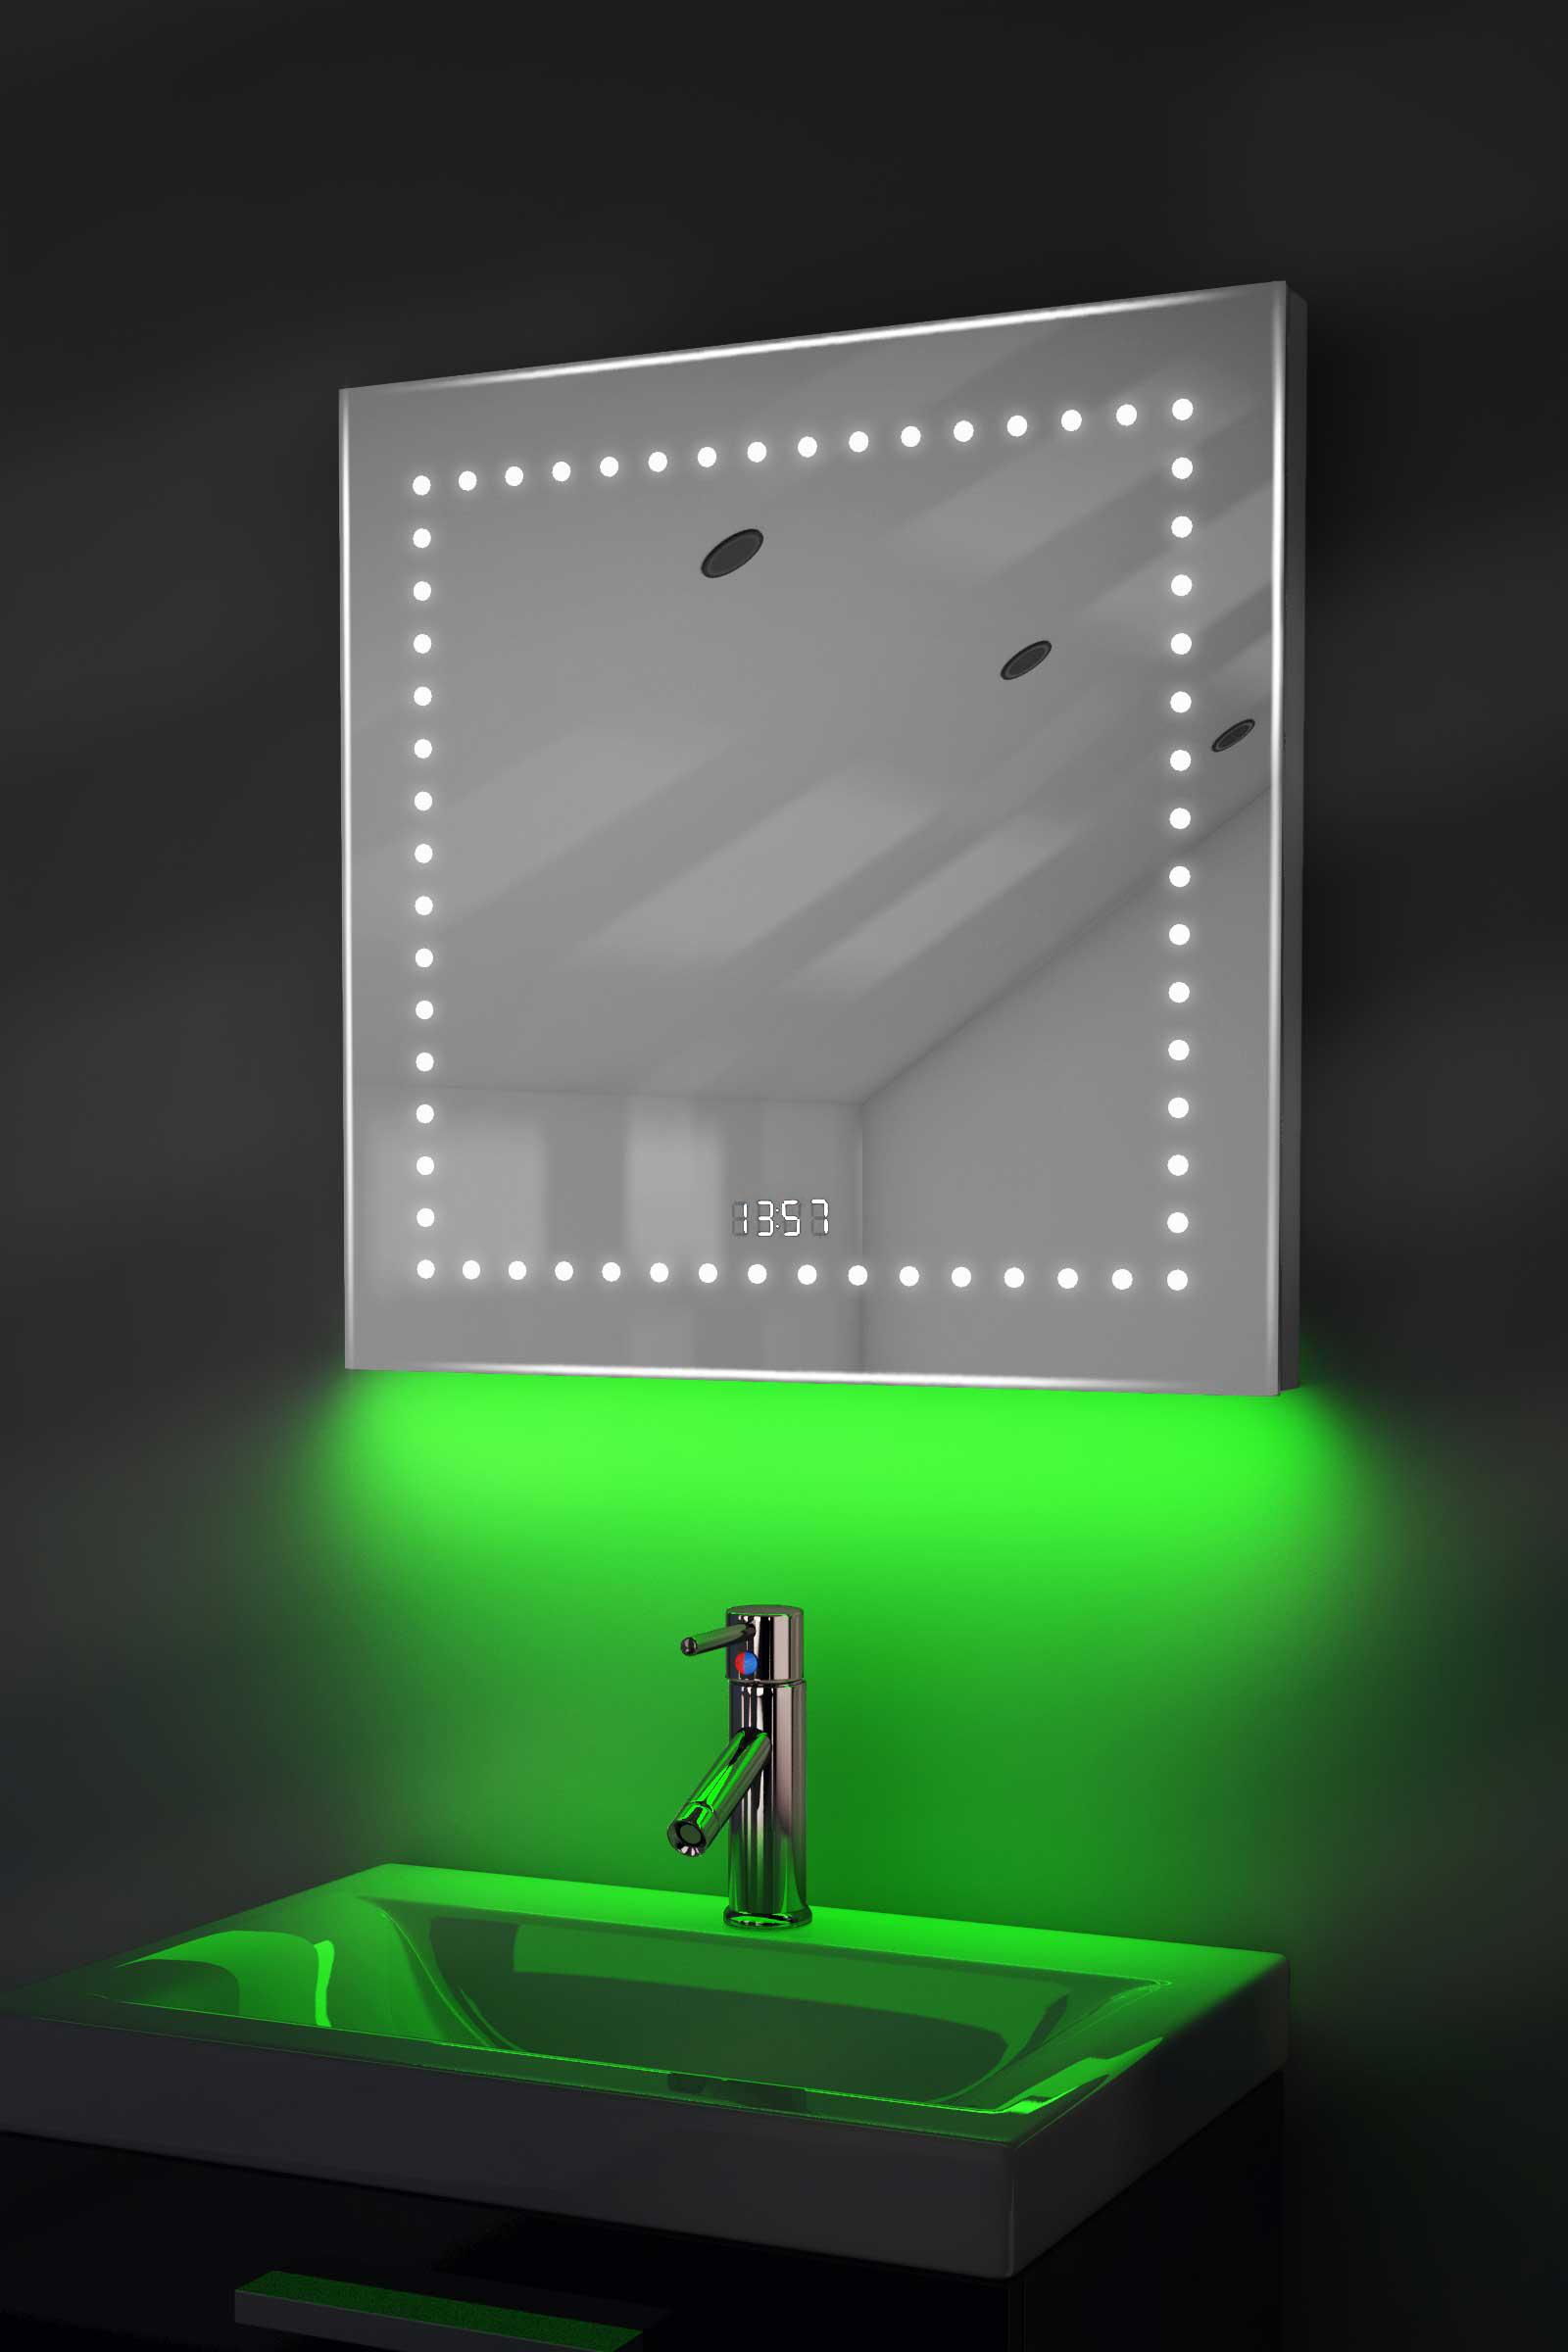 Digital Clock Shaver Bathroom Mirror With Under Lighting Demist Sensor K183g Ebay